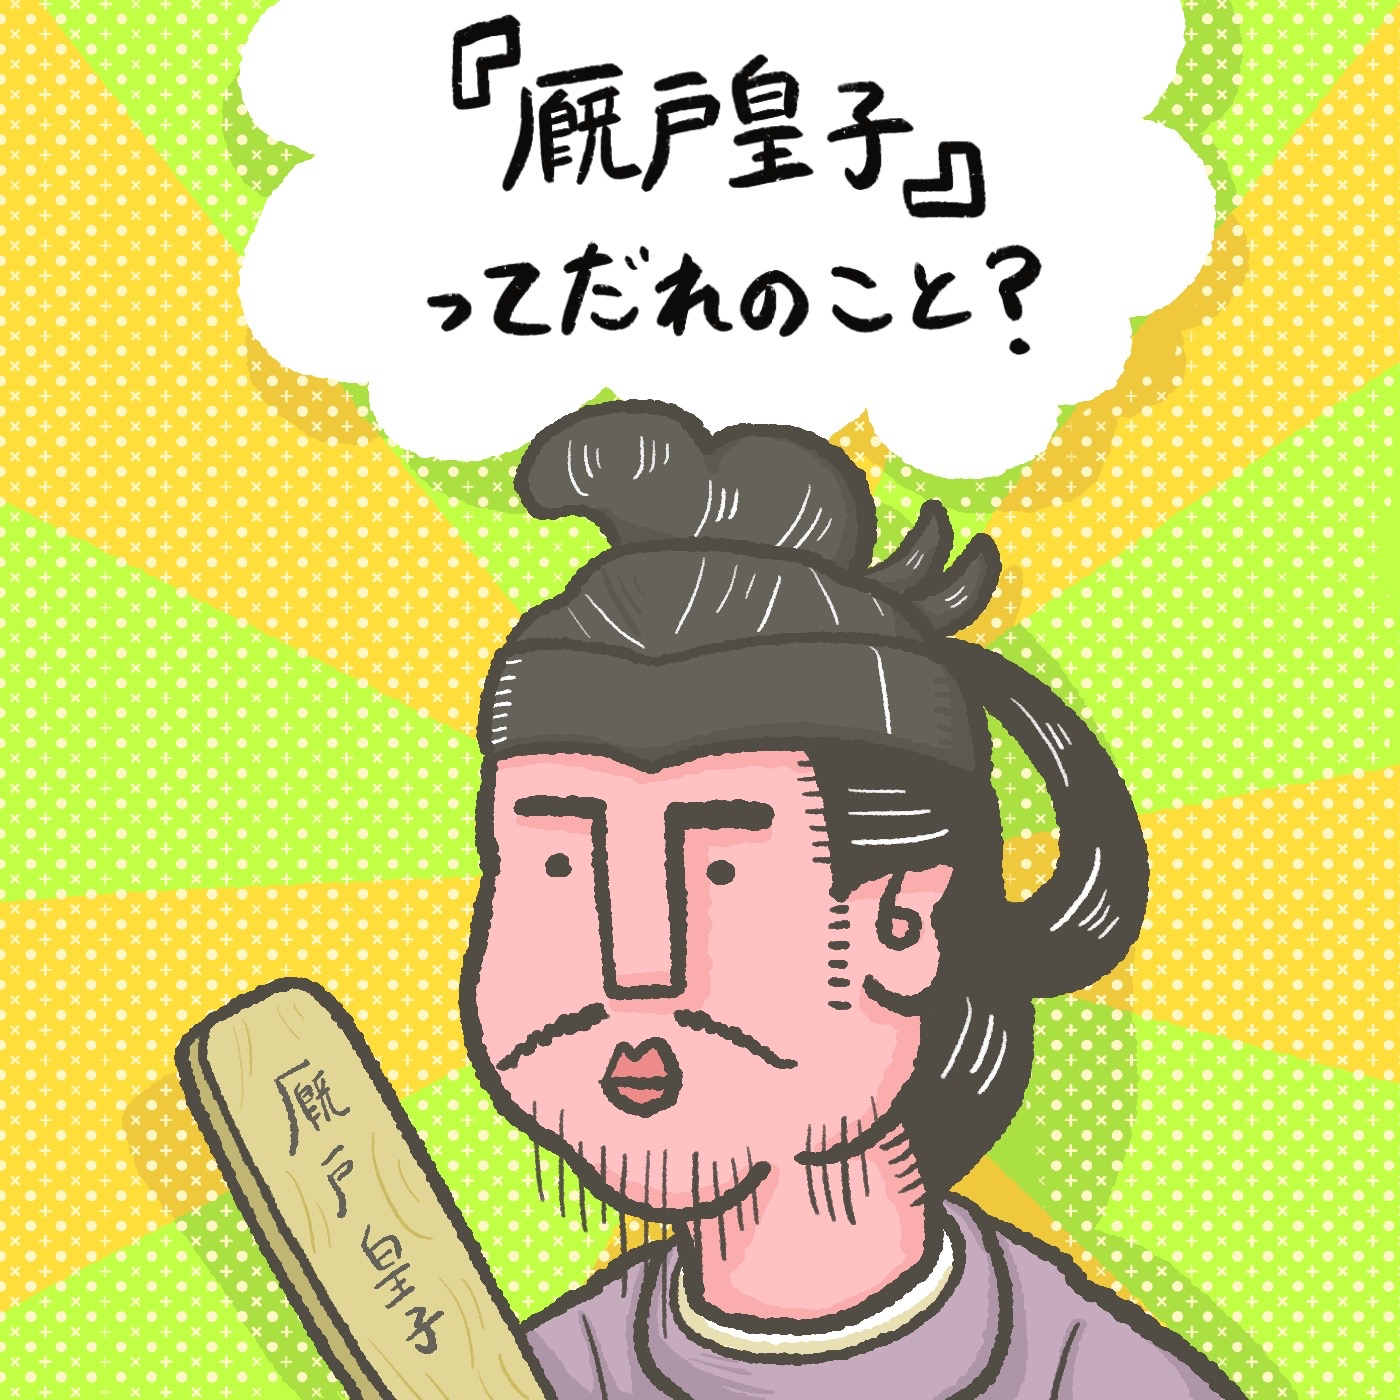 聖徳太子 国宝 聖徳太子絵伝 トーハク 東京国立博物館 OBIKAKE ナニソレ